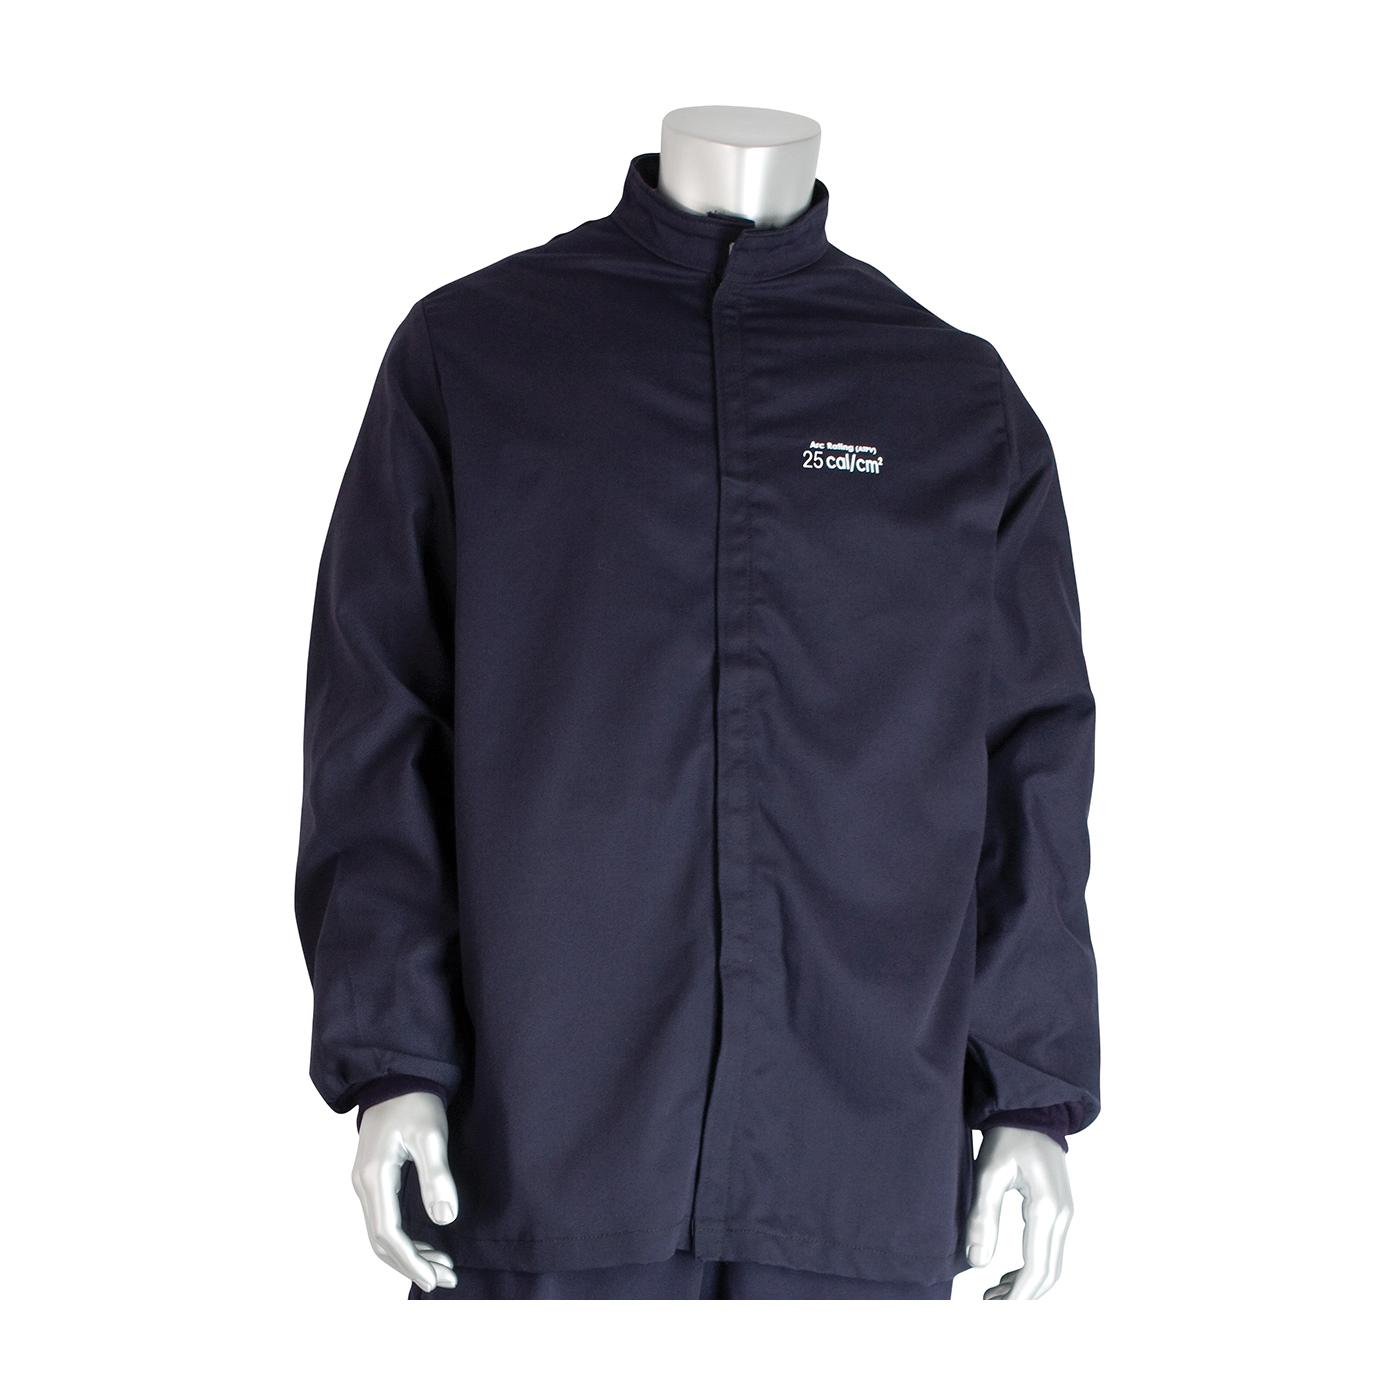 PIP® 9100-21721/2XL Arc and Flame Resistant Jacket, 2XL, Navy, Westex® UltraSoft® 88% Cotton 12% High Tenacity Nylon, 52 to 54 in Chest, Resists: Arc and Flame, ASTM F1506-10a, ASTM F2178-12